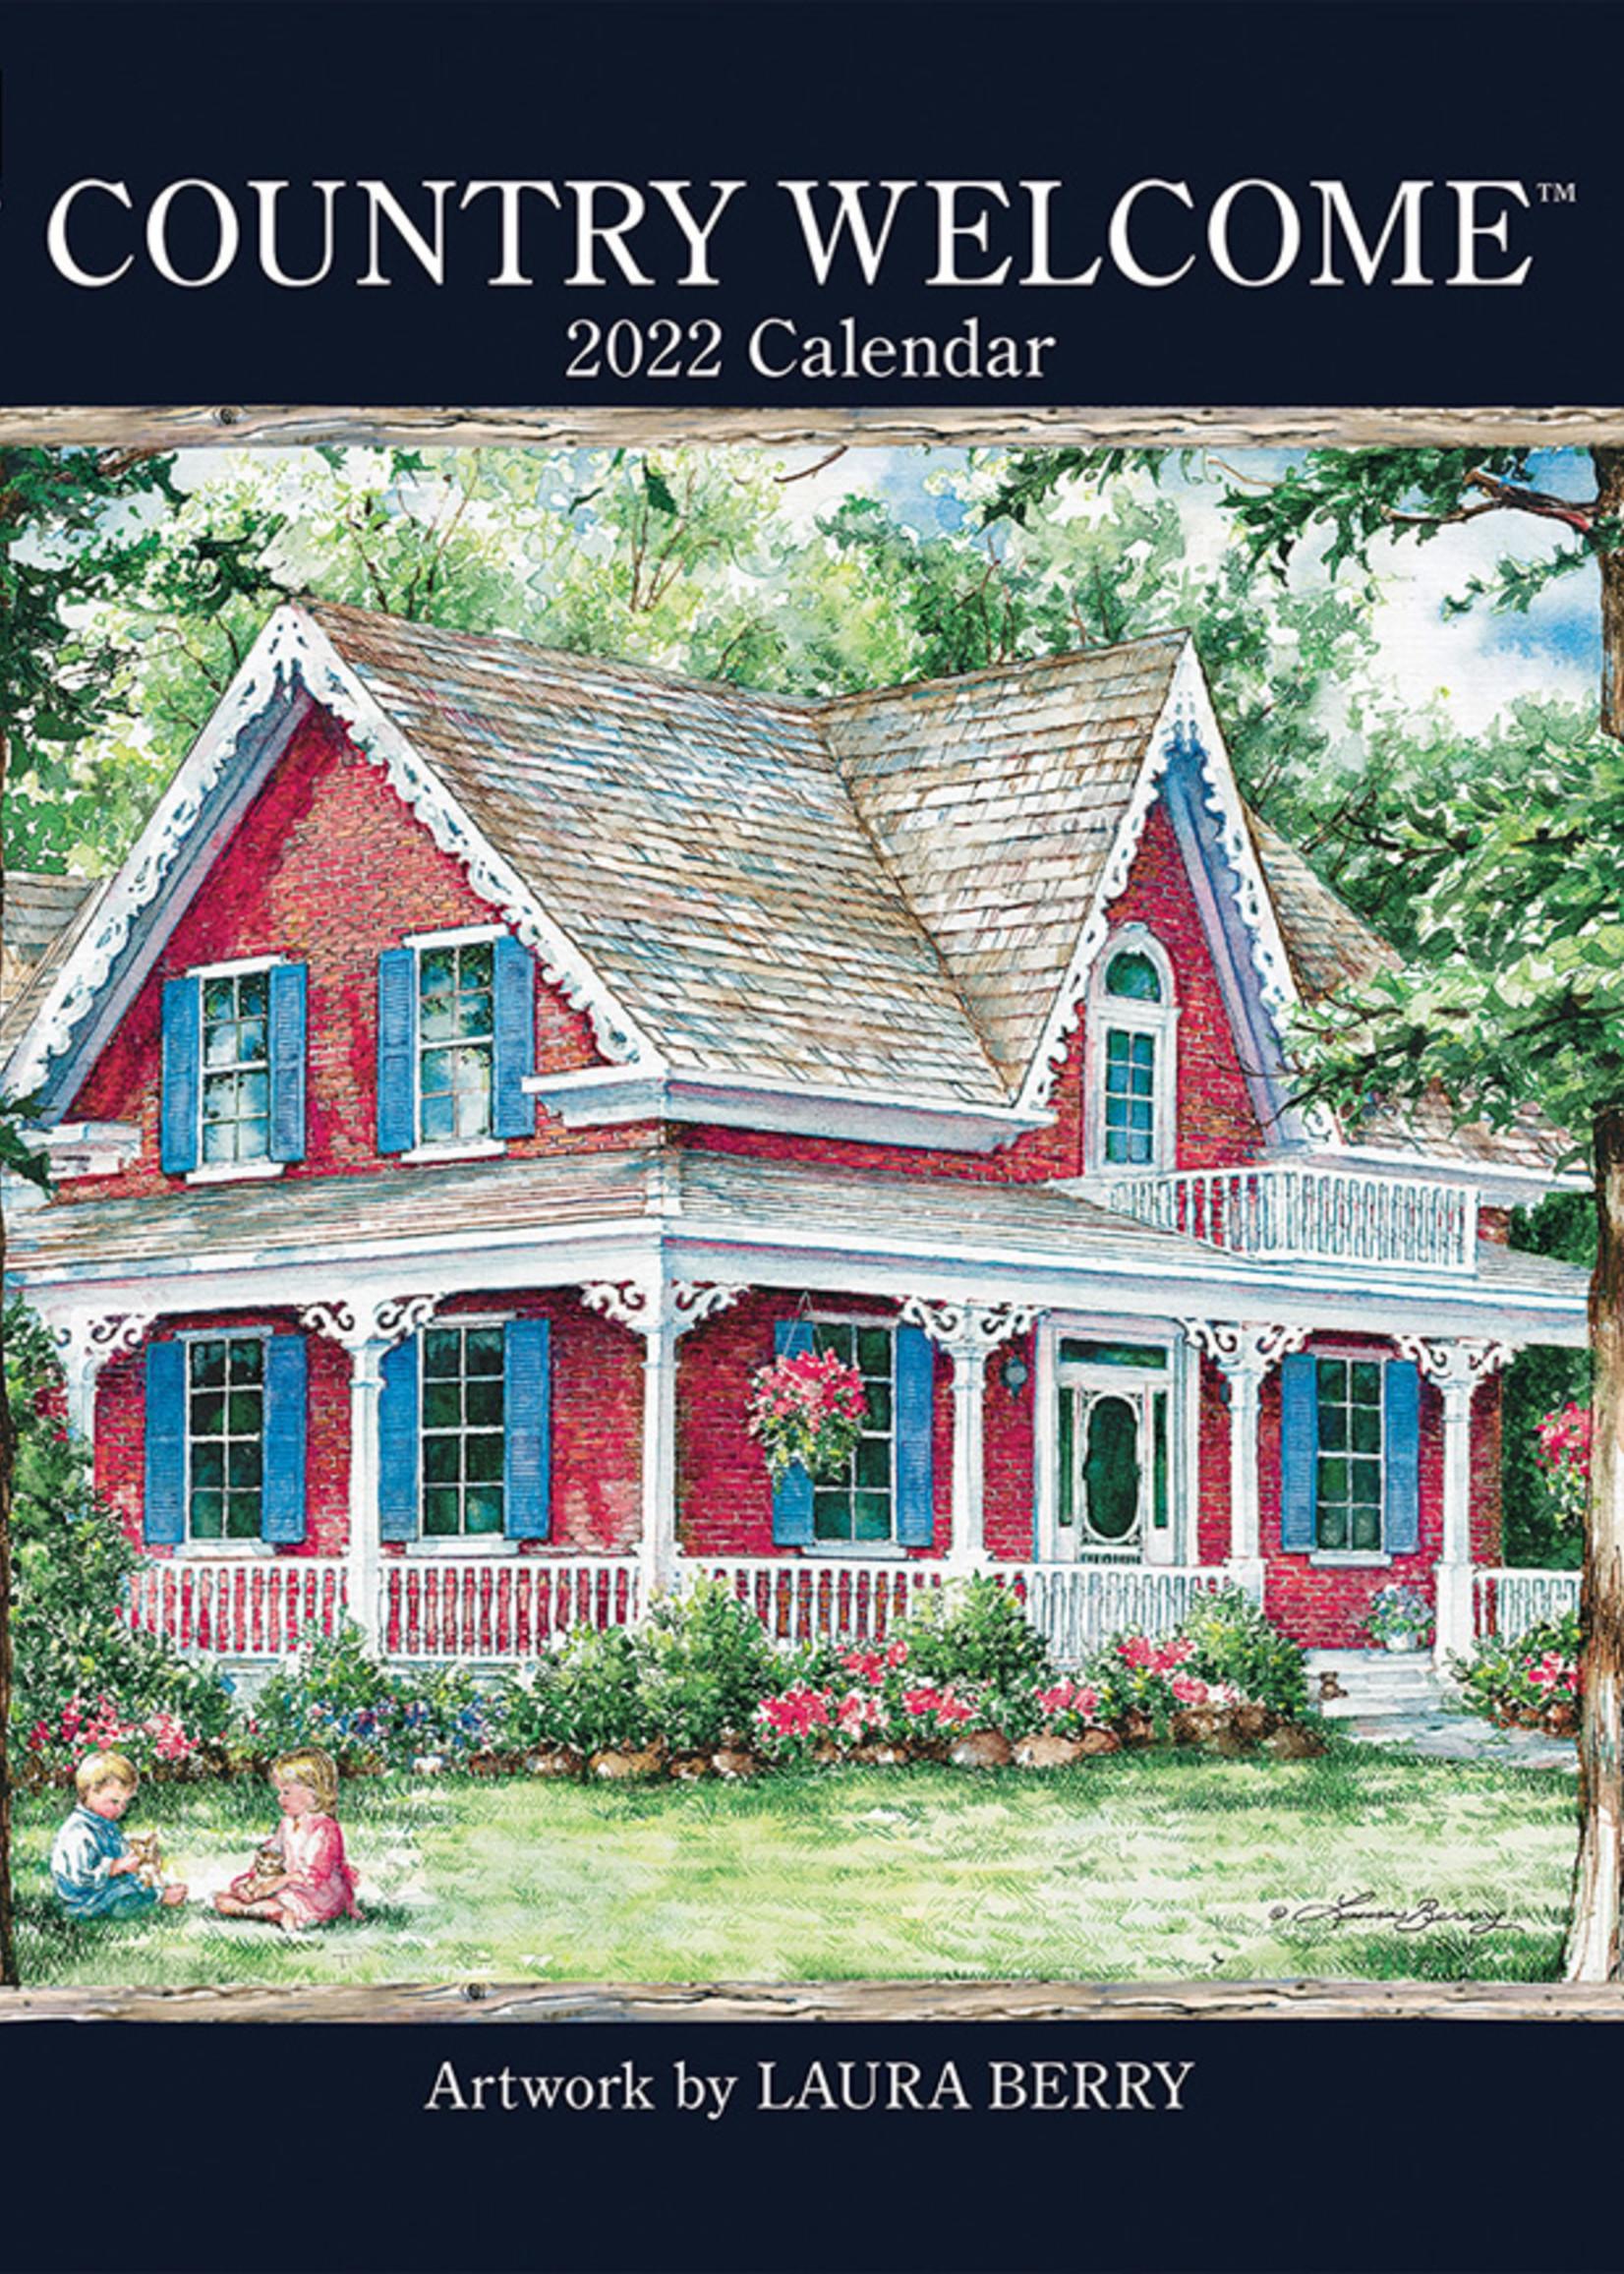 Country Welcome Calendar 2022